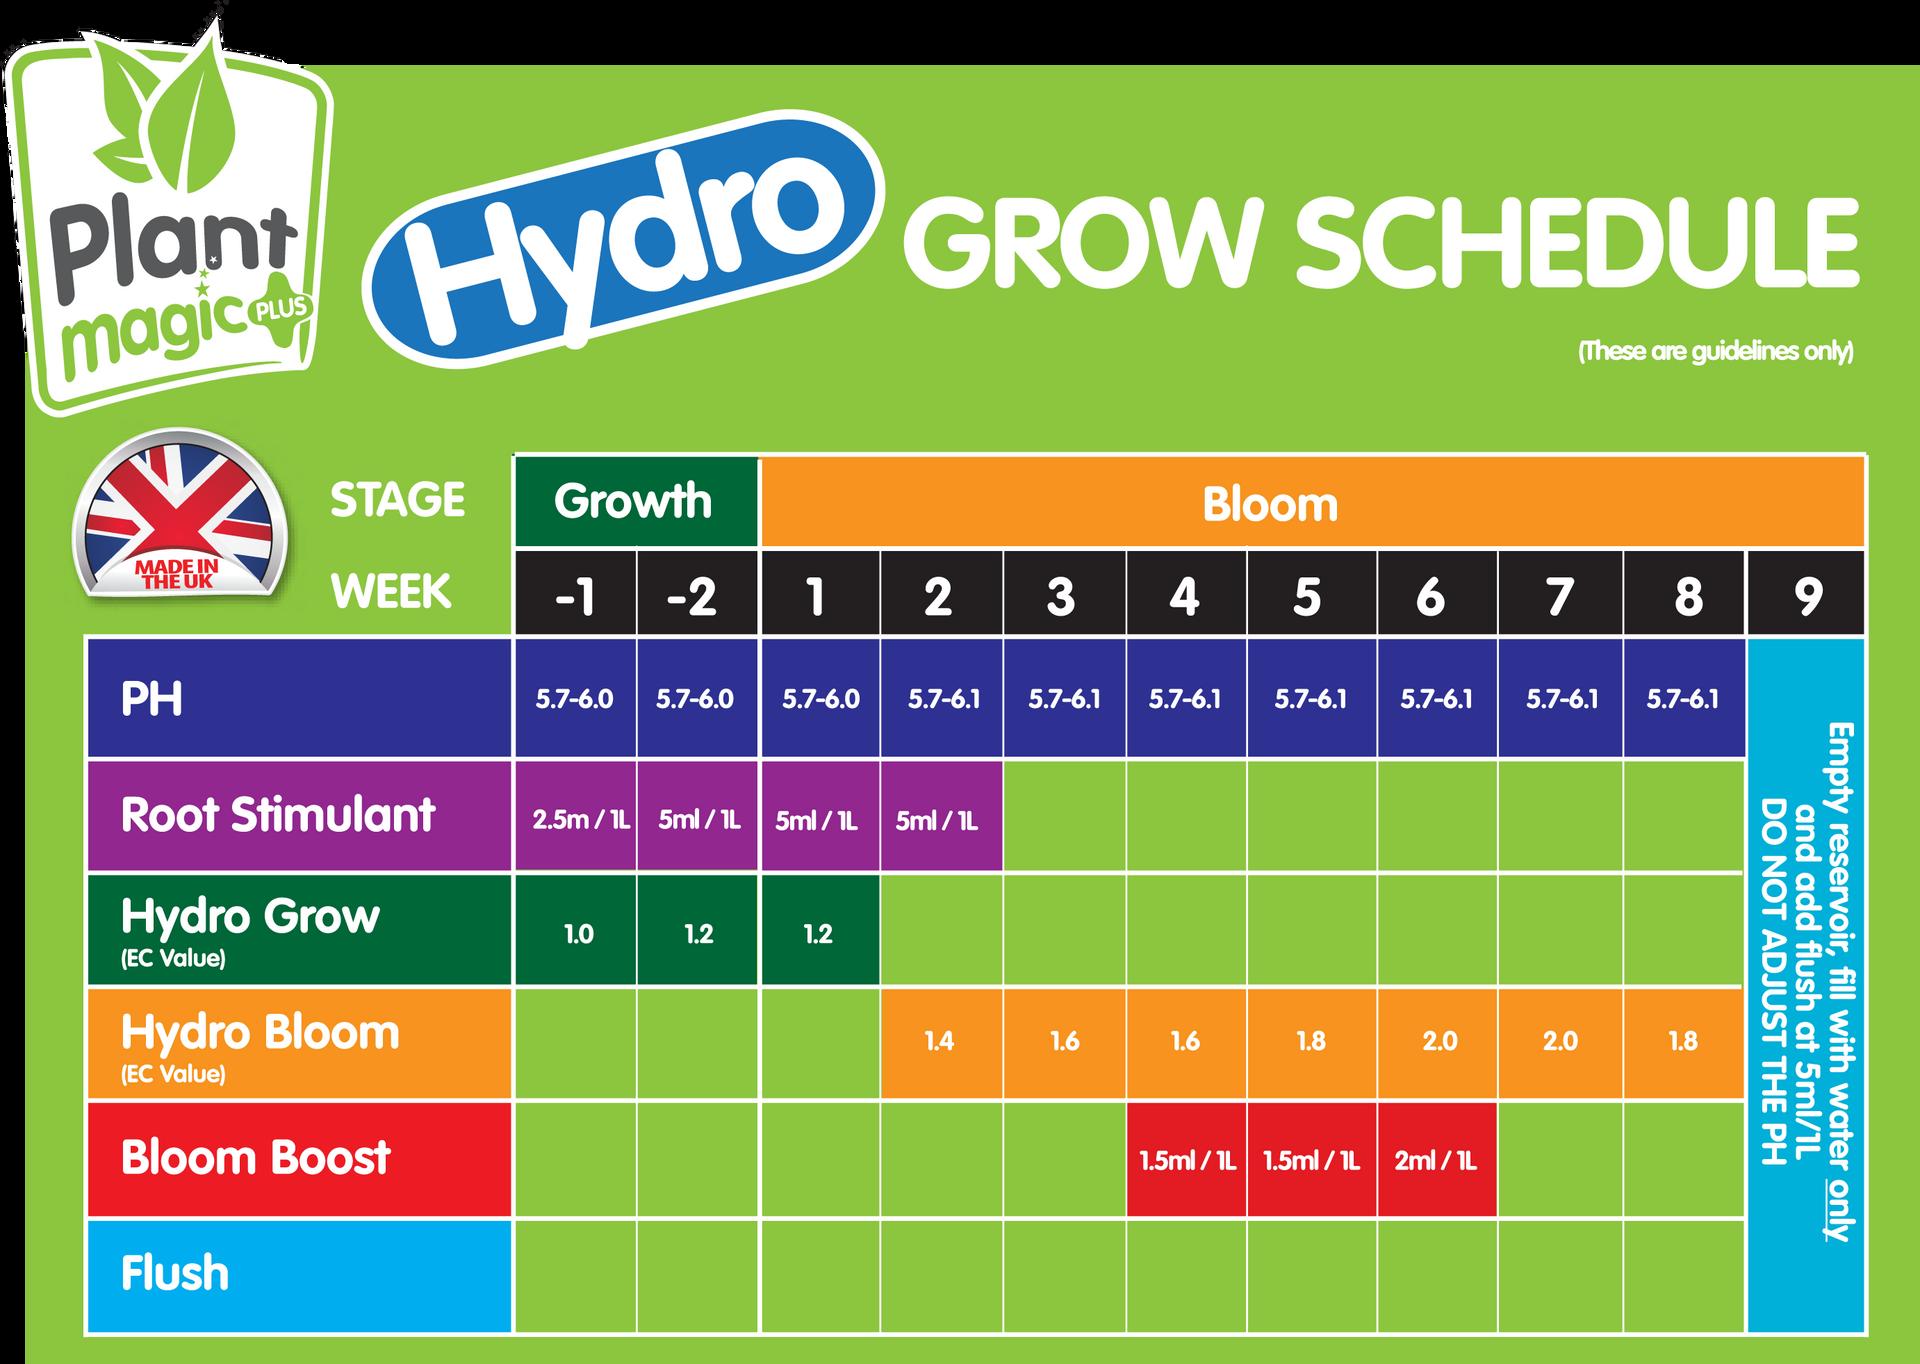 Plant Magic Hydro